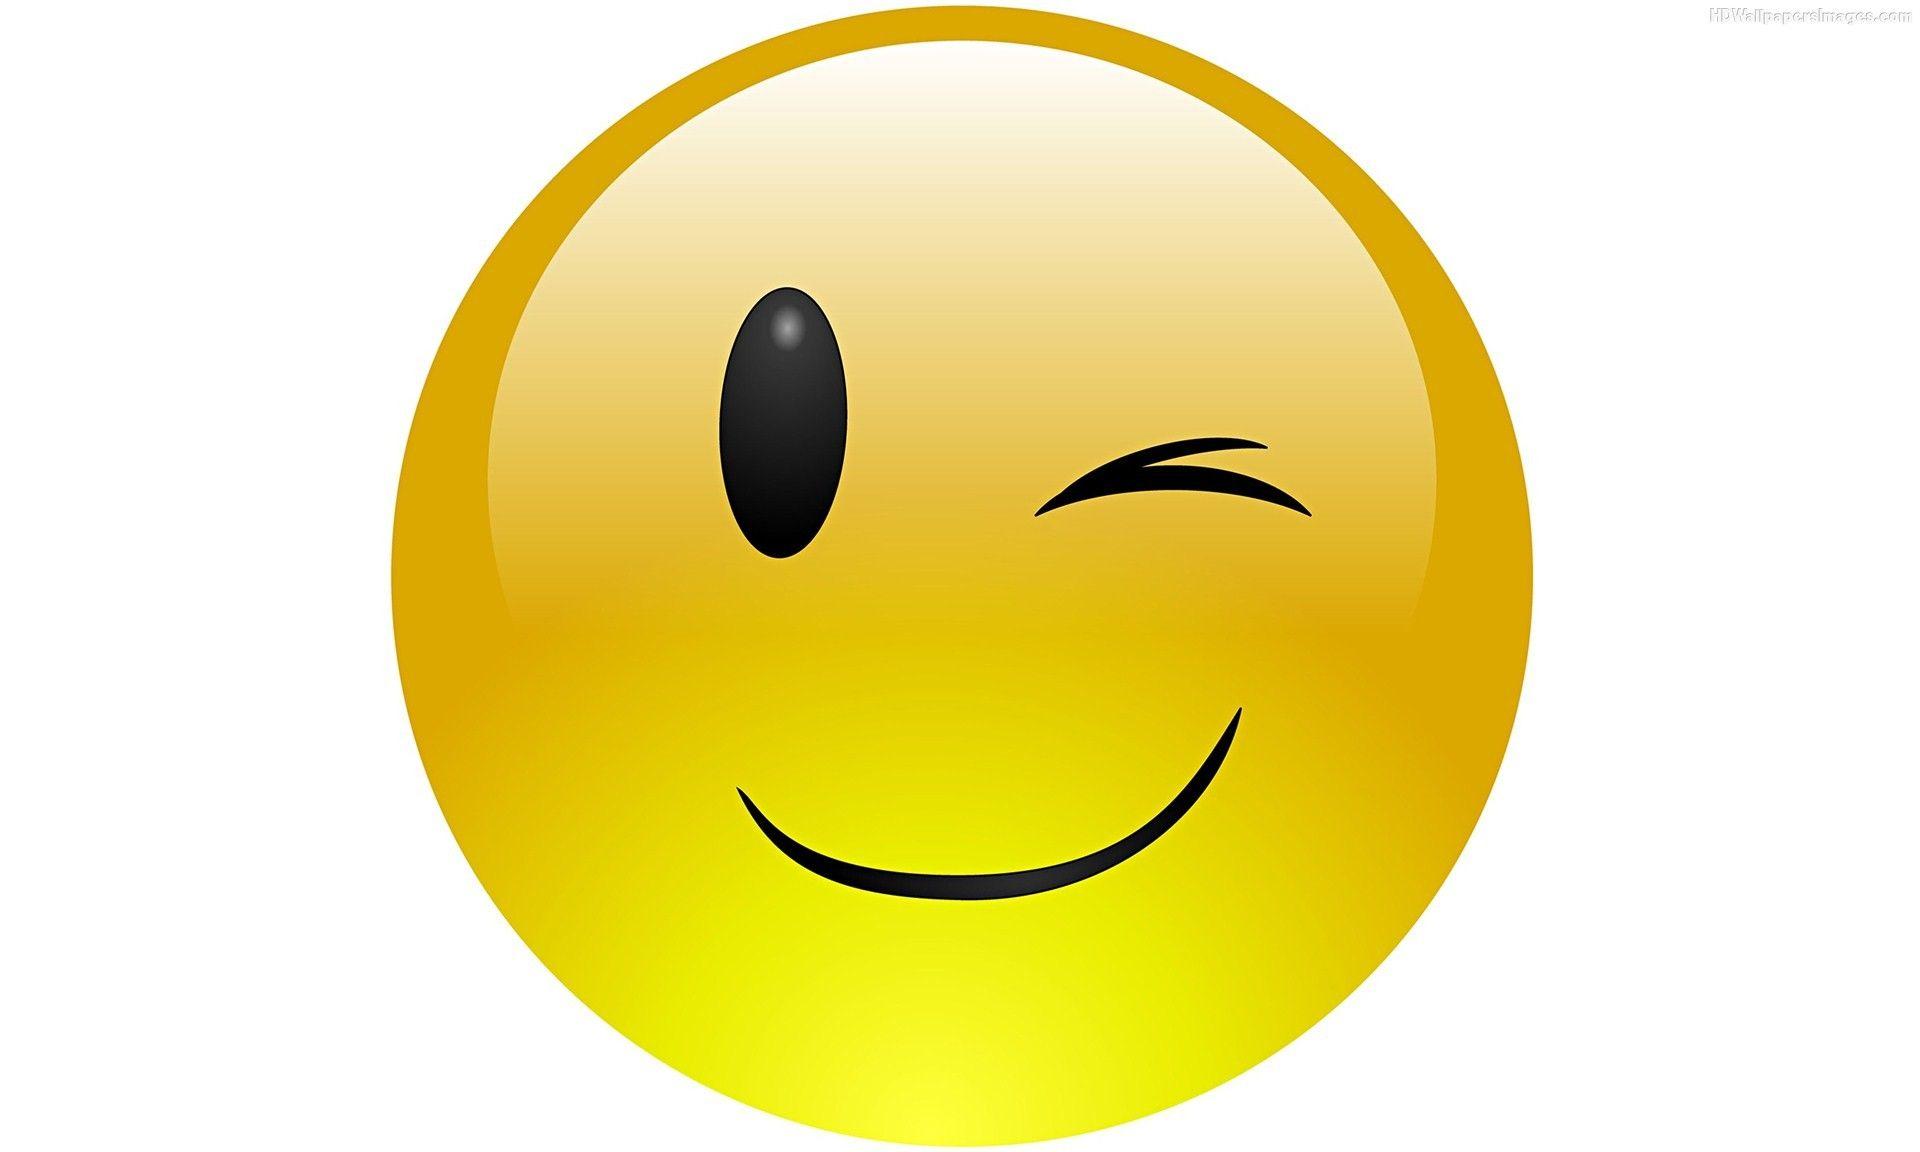 Emoji-Face-Wink-Yellow-Images - Bite Edge | Headshot Logo ...